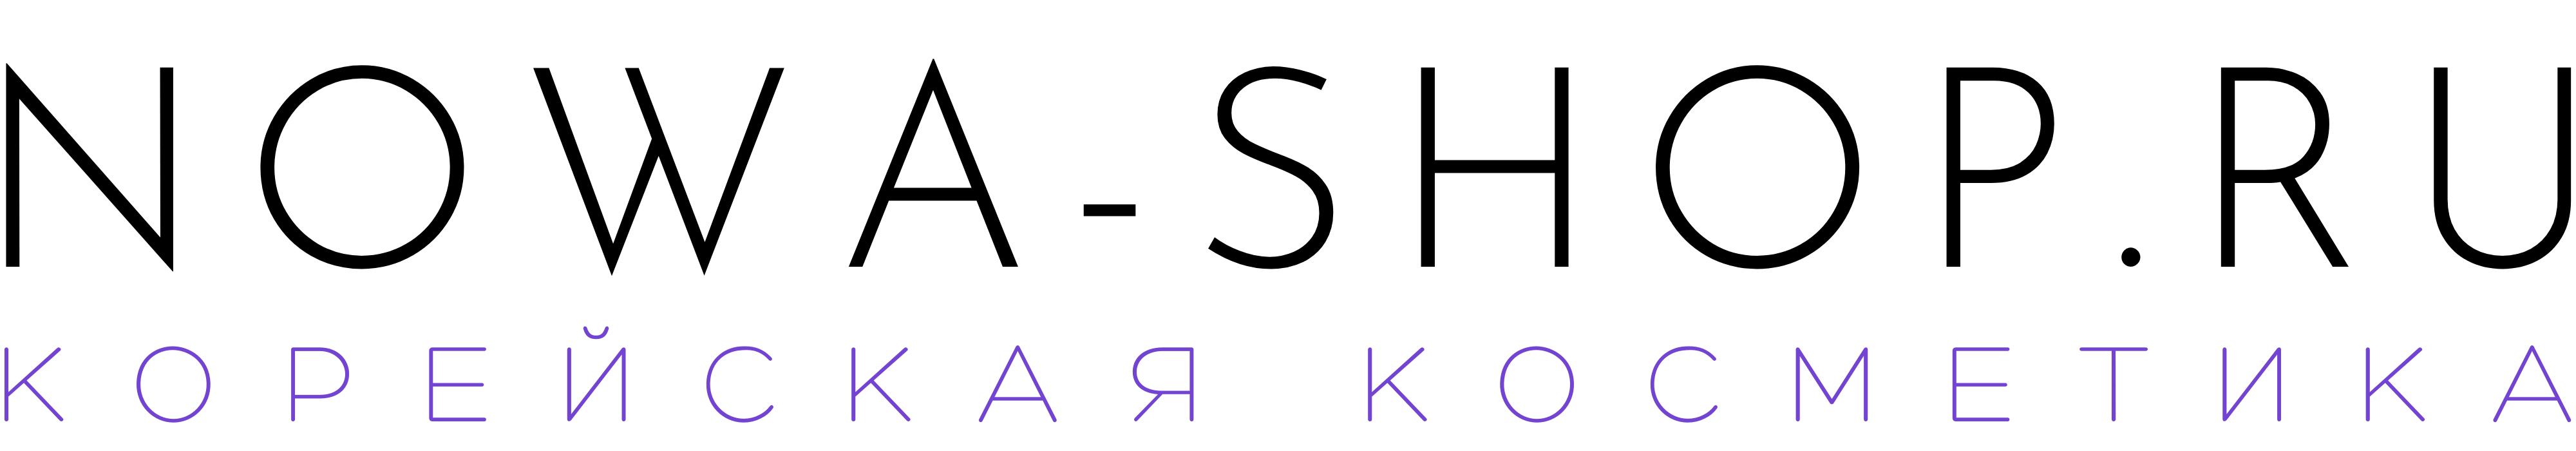 Интернет-магазин корейской косметики Nowa-shop.ru